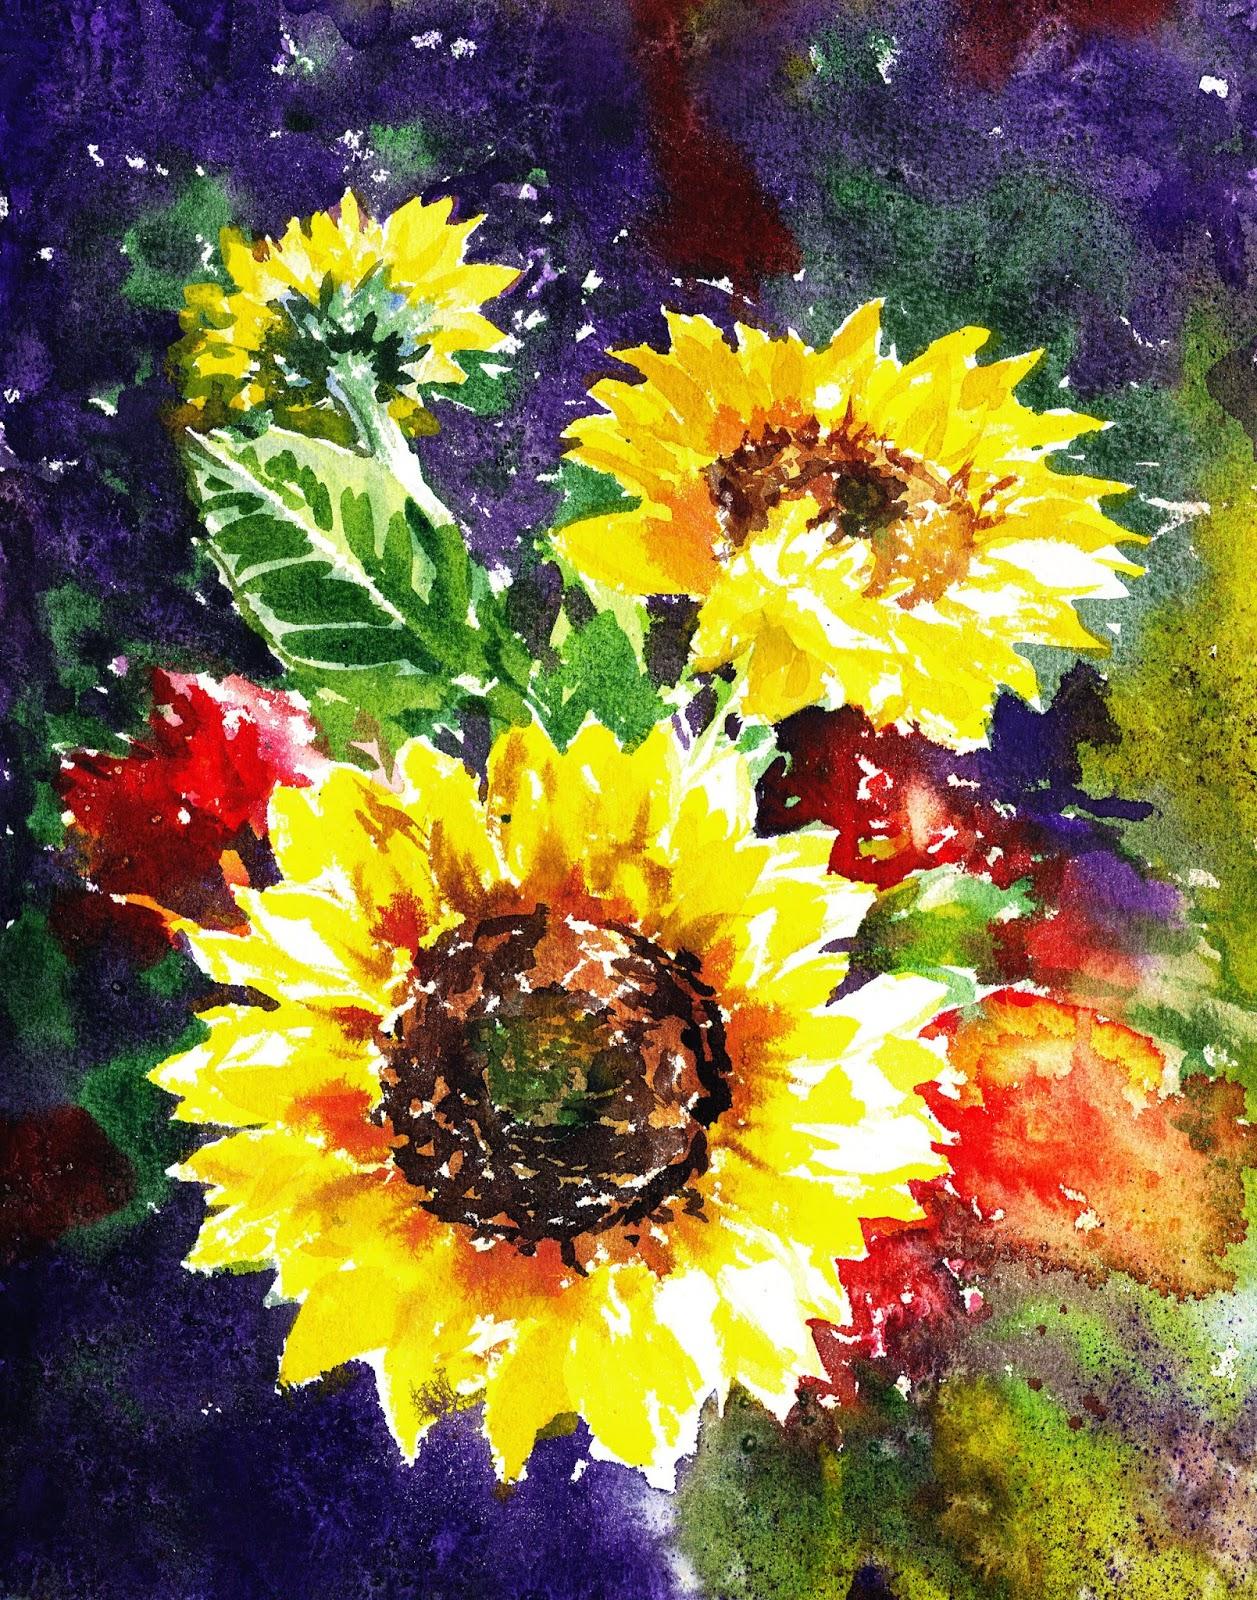 impressionistic floral design